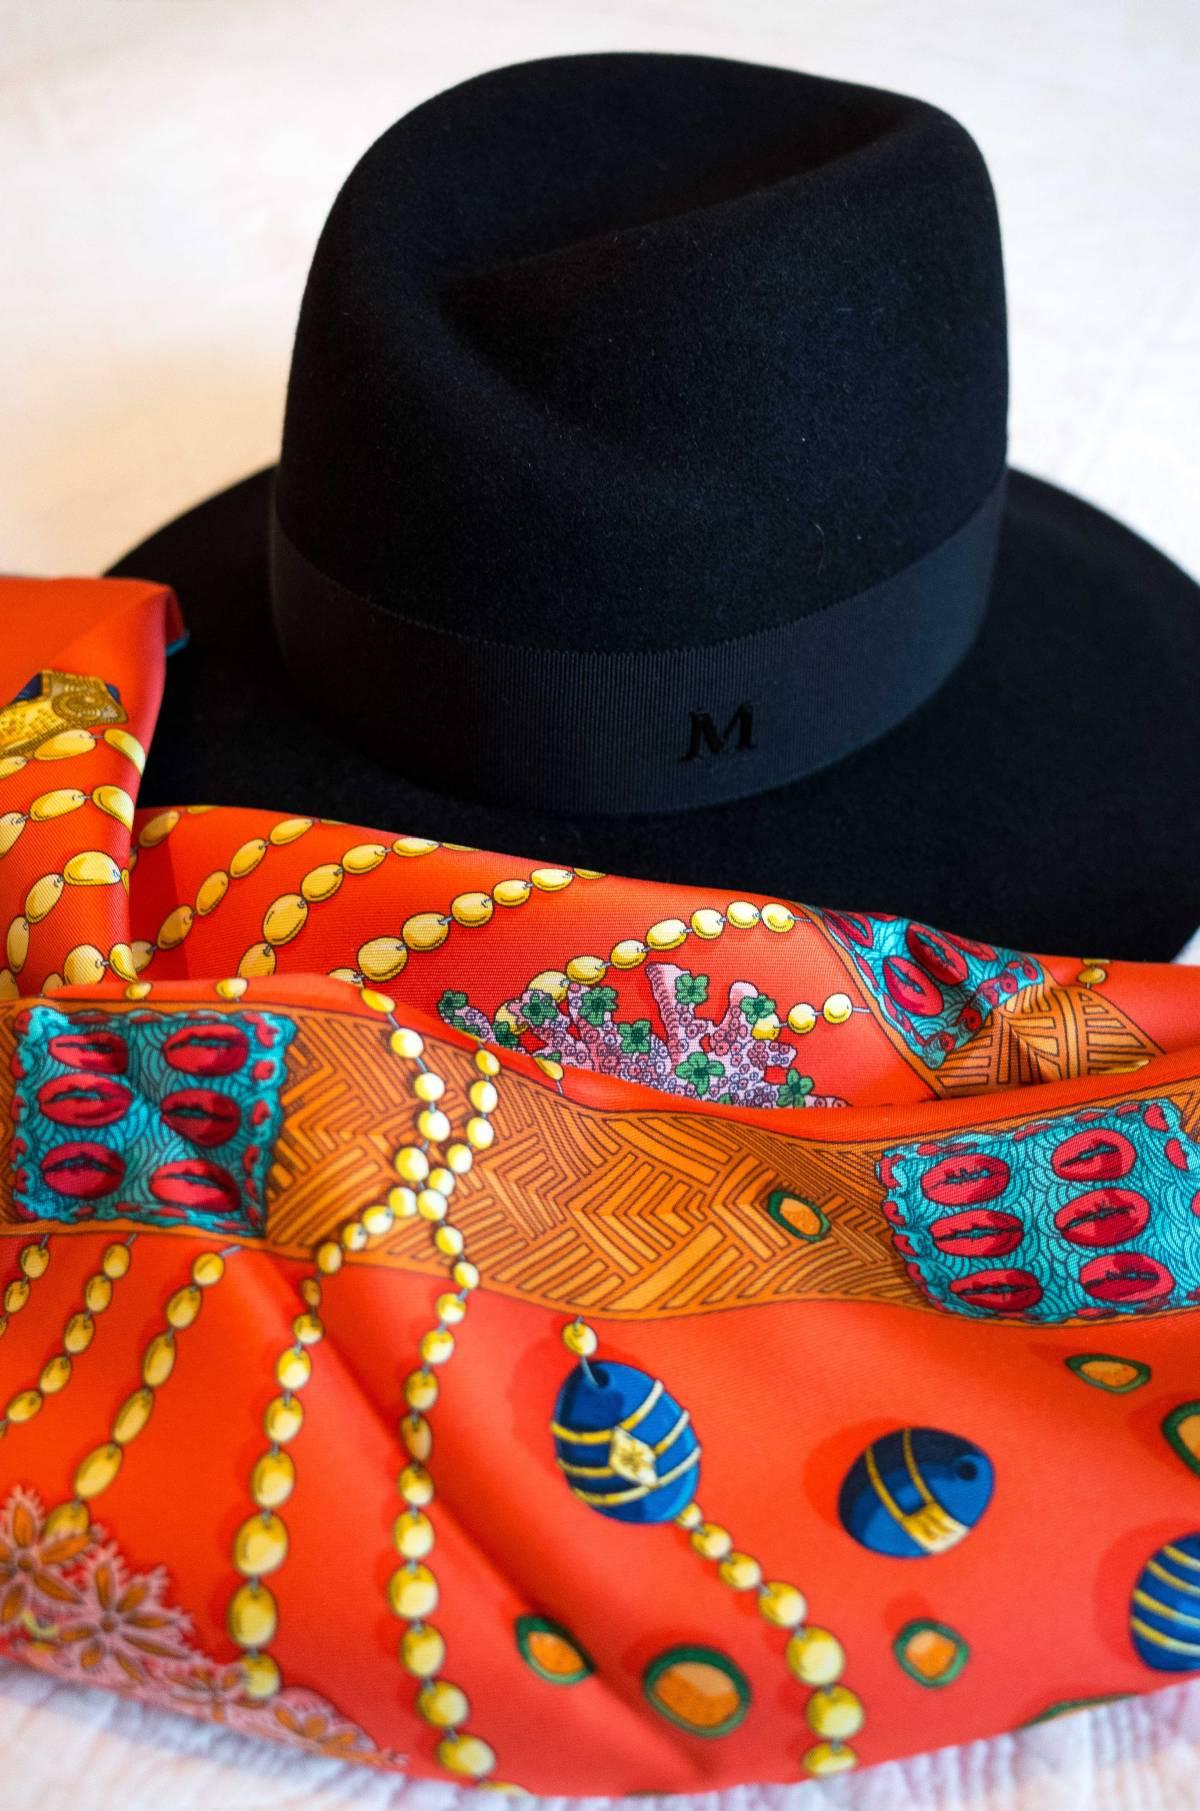 Maison Michel, Virginie, Chemins de Corail, Annie Faivre, Hermes scarf, carre, knot, knotting, tutorial, hermes carre, Hermes Schal, эрмес, платок, карре, как красиво завязать платок, how to wear a scarf